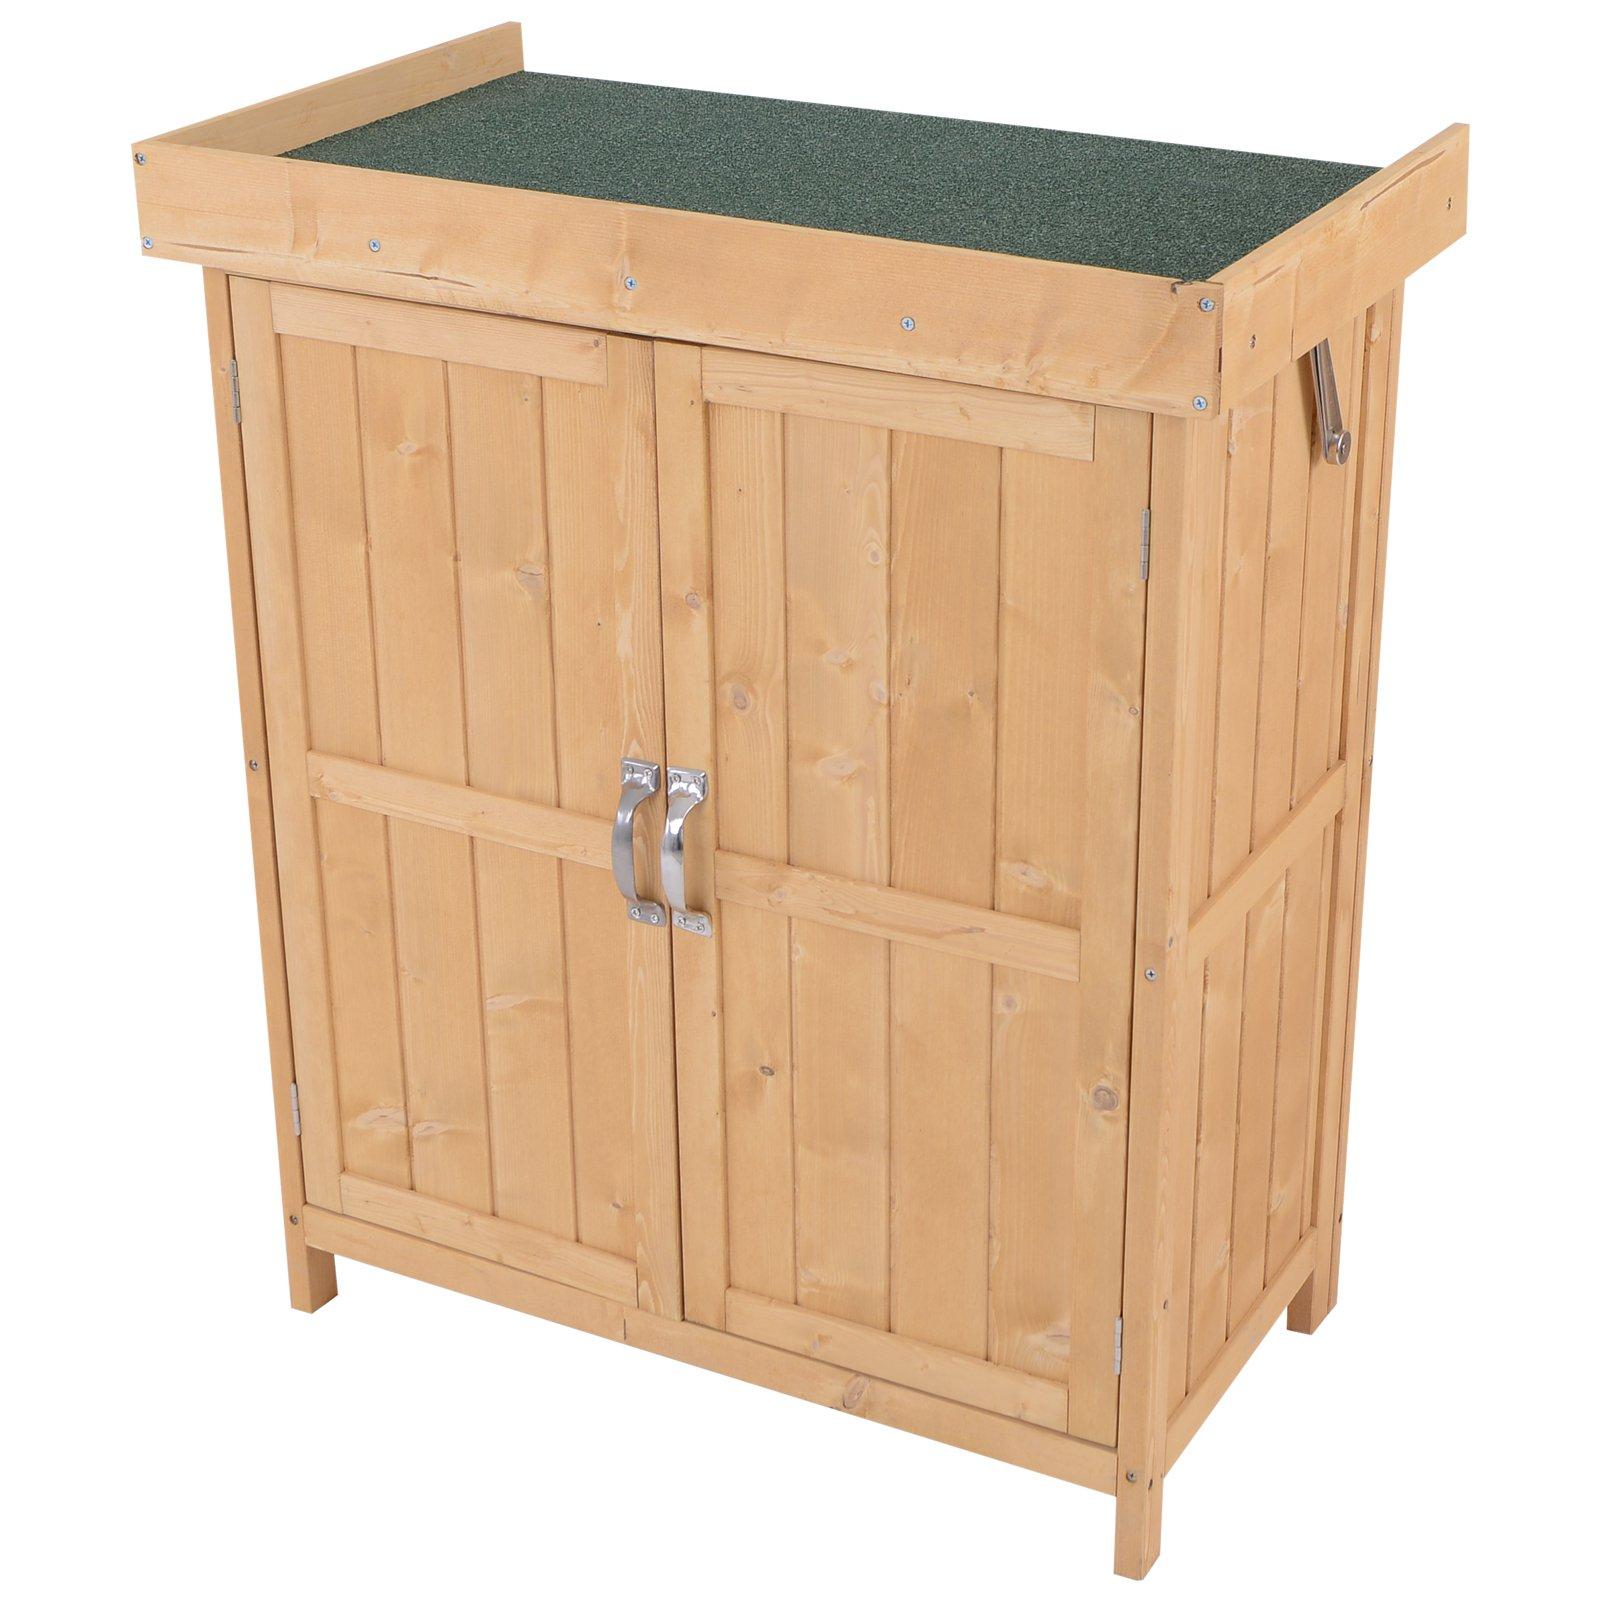 Outsunny 1.4 x 2.4ft Mini Garden Storage Cabinet £84.59 (UK Mainland) @ AOSOM (use code)